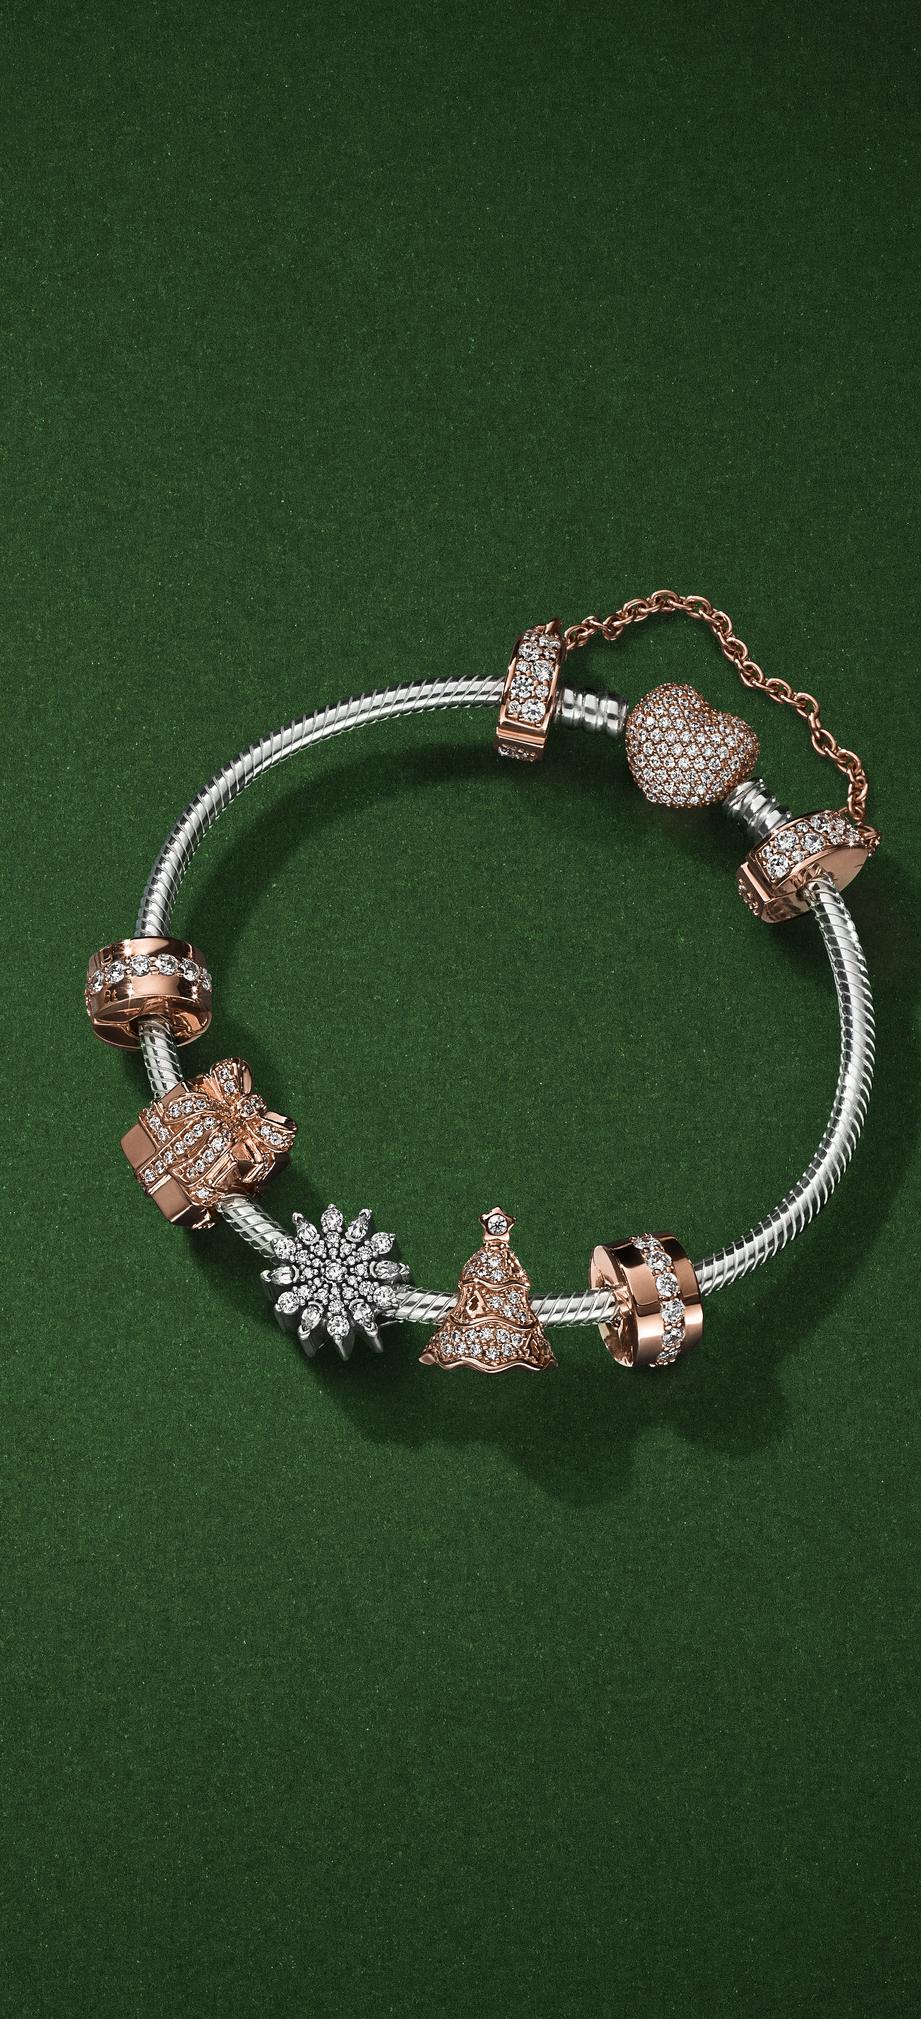 Adorn Your Wrist With Sparkling Christmas Charms In Pandora Rose Our Unique Blush Metal B Pandora Bracelet Designs Pandora Jewelry Charms Mens Bracelet Silver